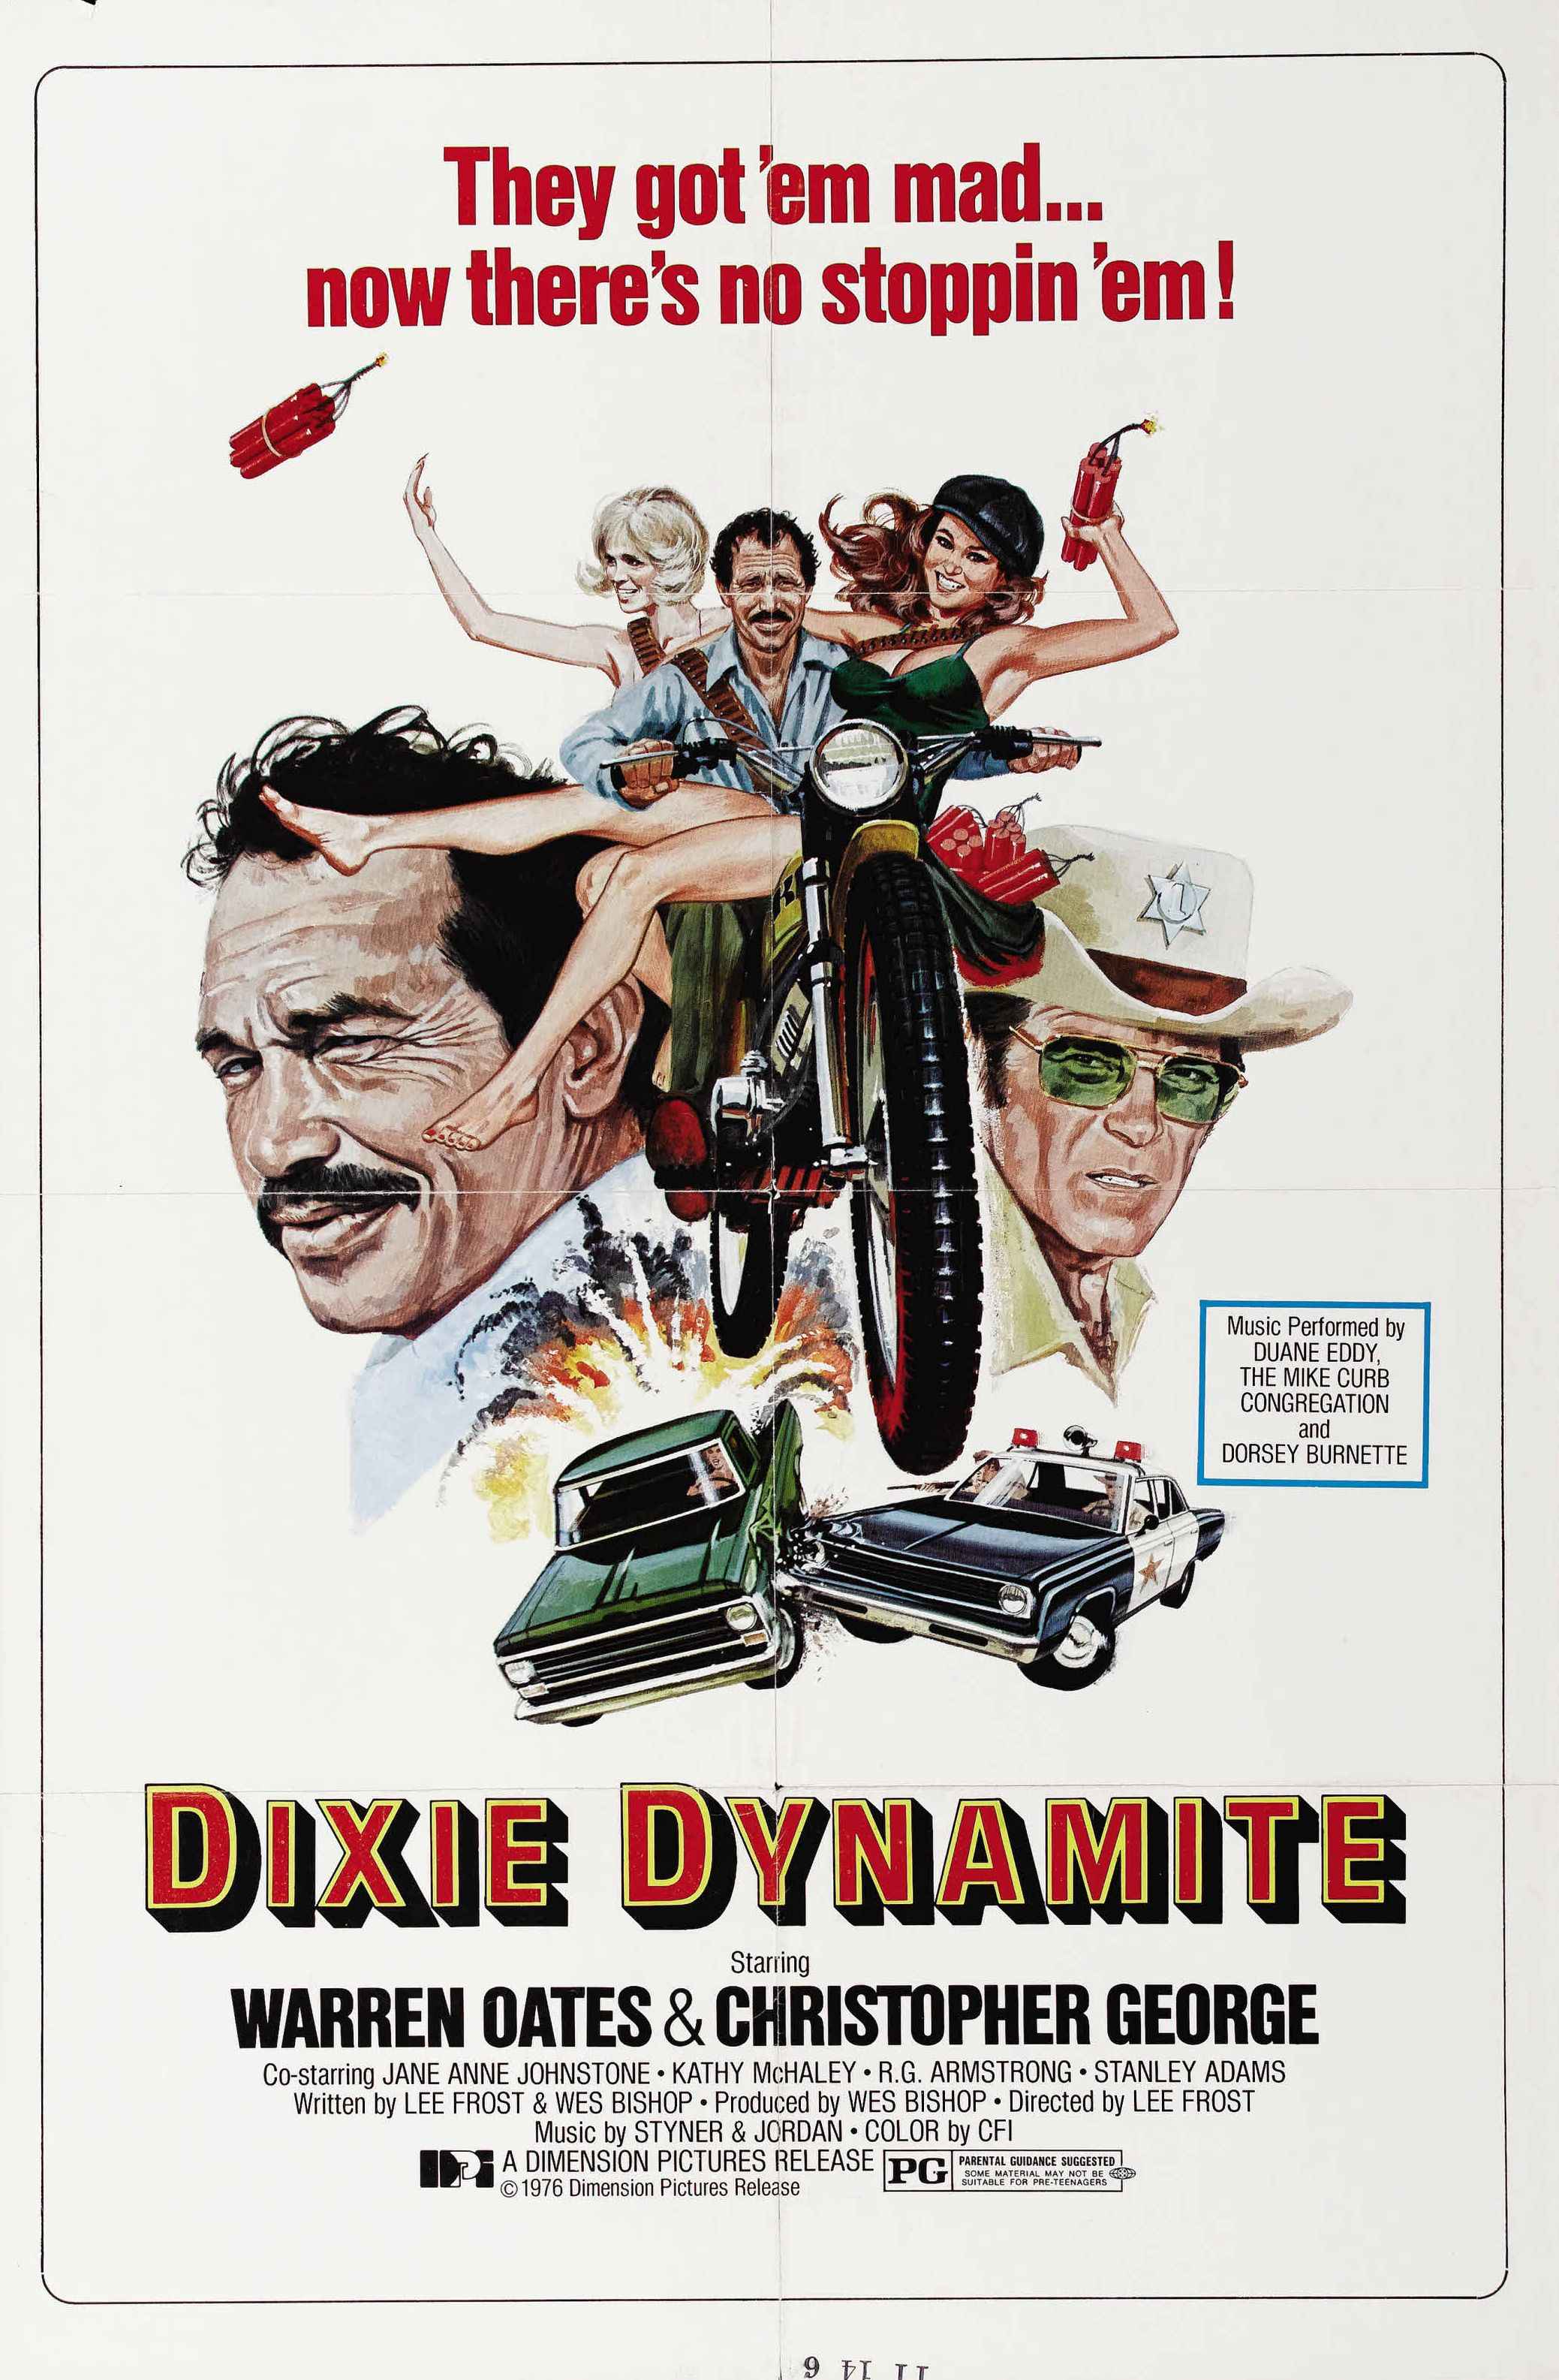 Dixie dynamite images 86